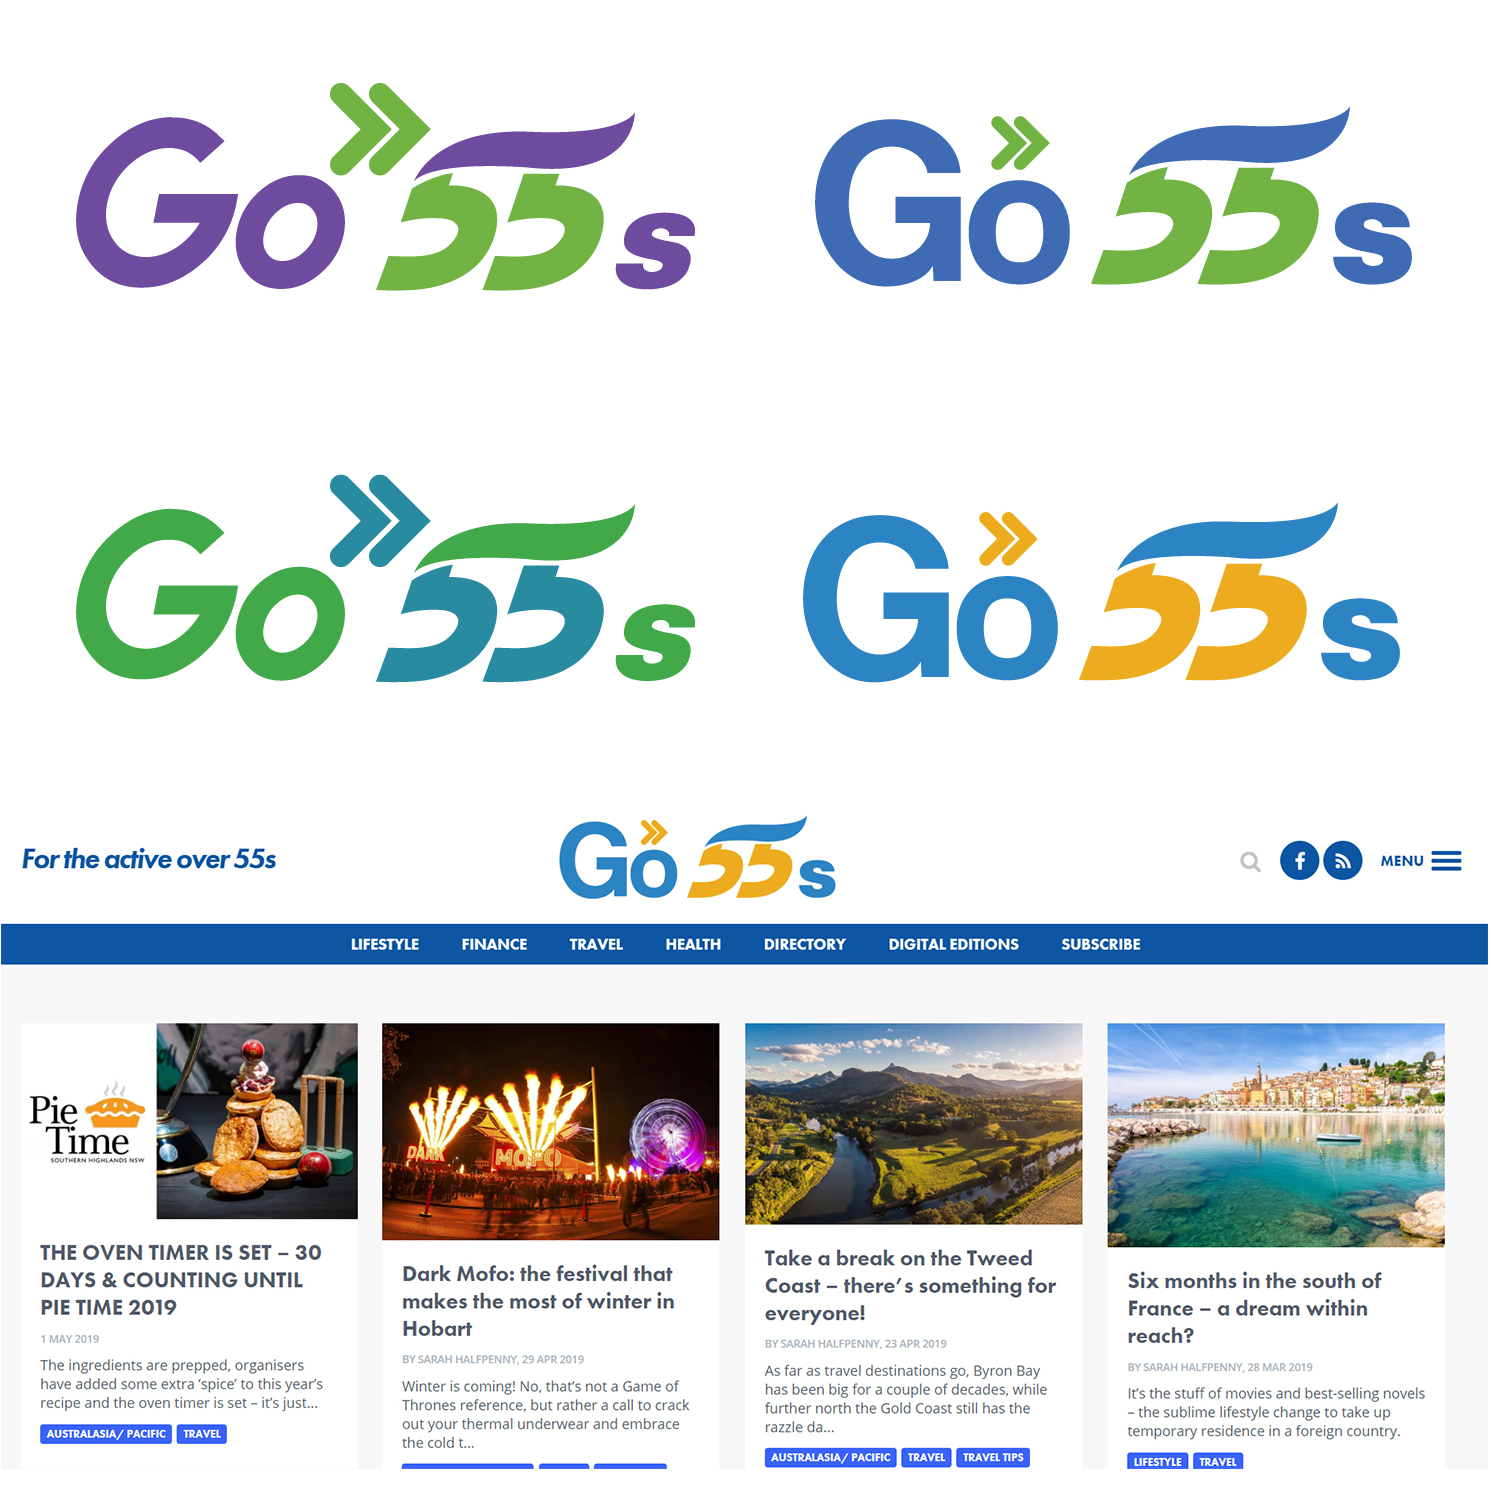 Elegant, Playful Logo Design for Go55s by Selena design   Design